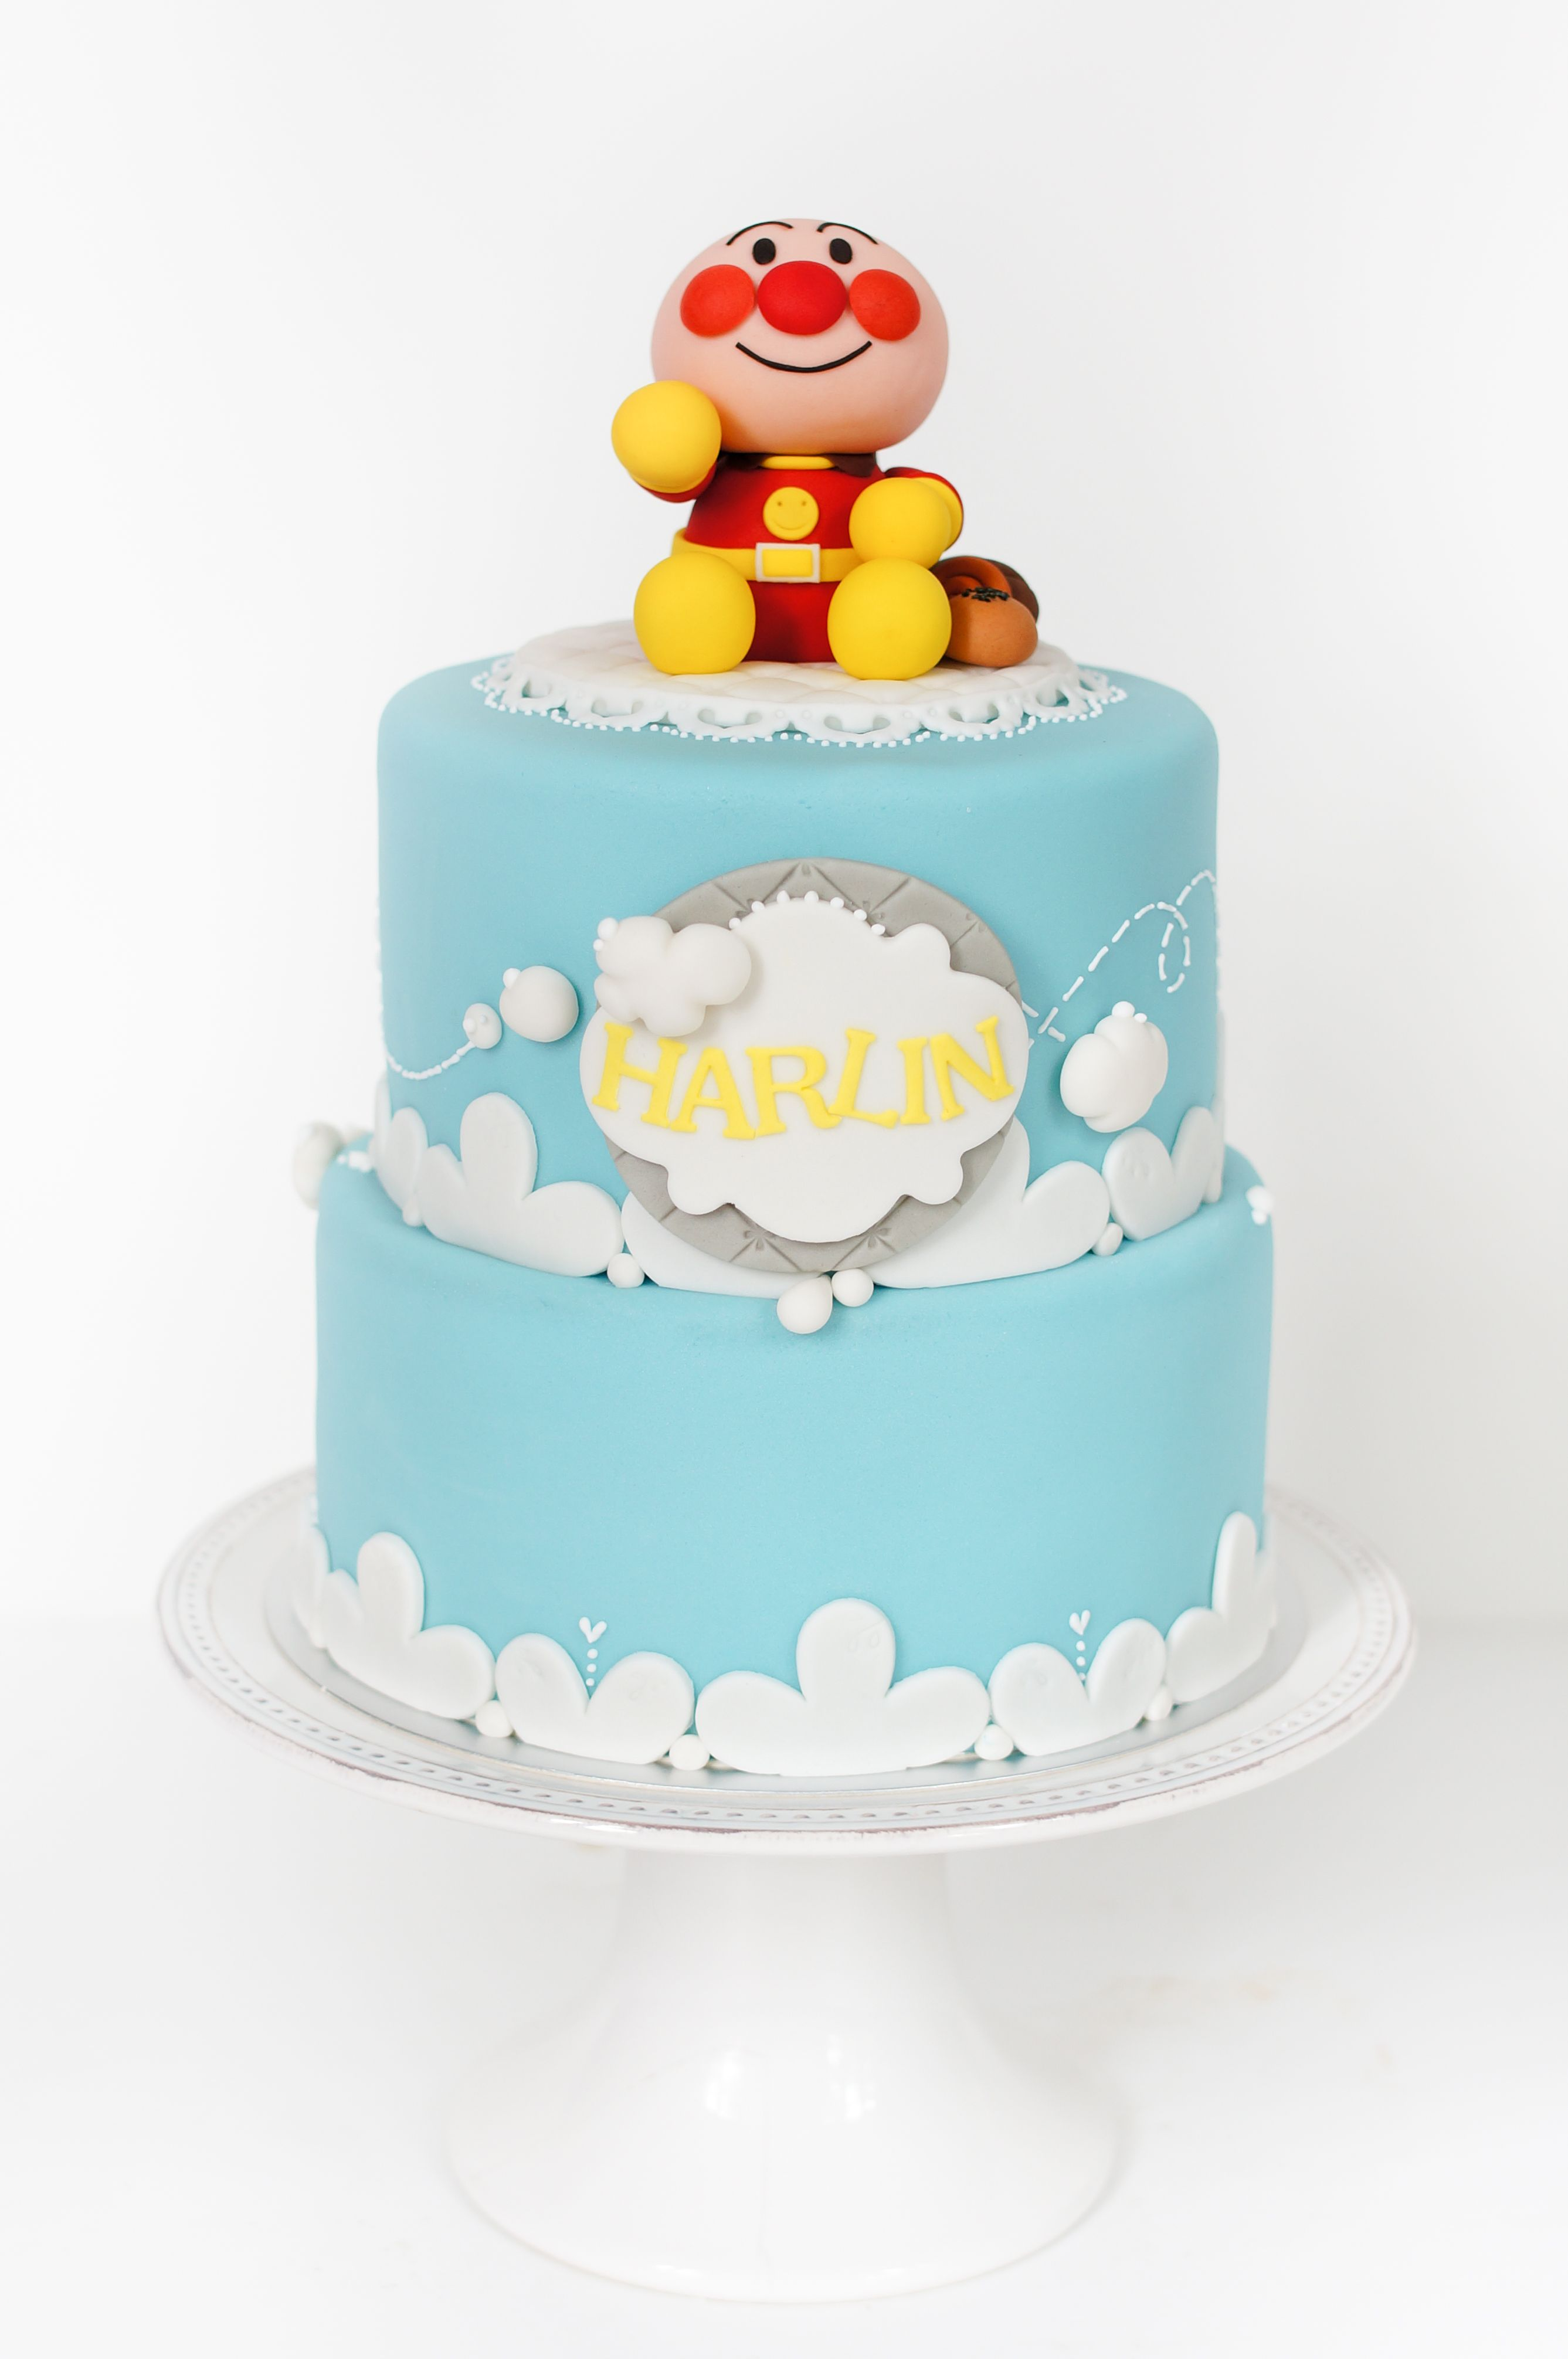 Cake ideas on pinterest pirate cakes marshmallow fondant and - Cake Marshmallow Fondantfondant Cakesfondant